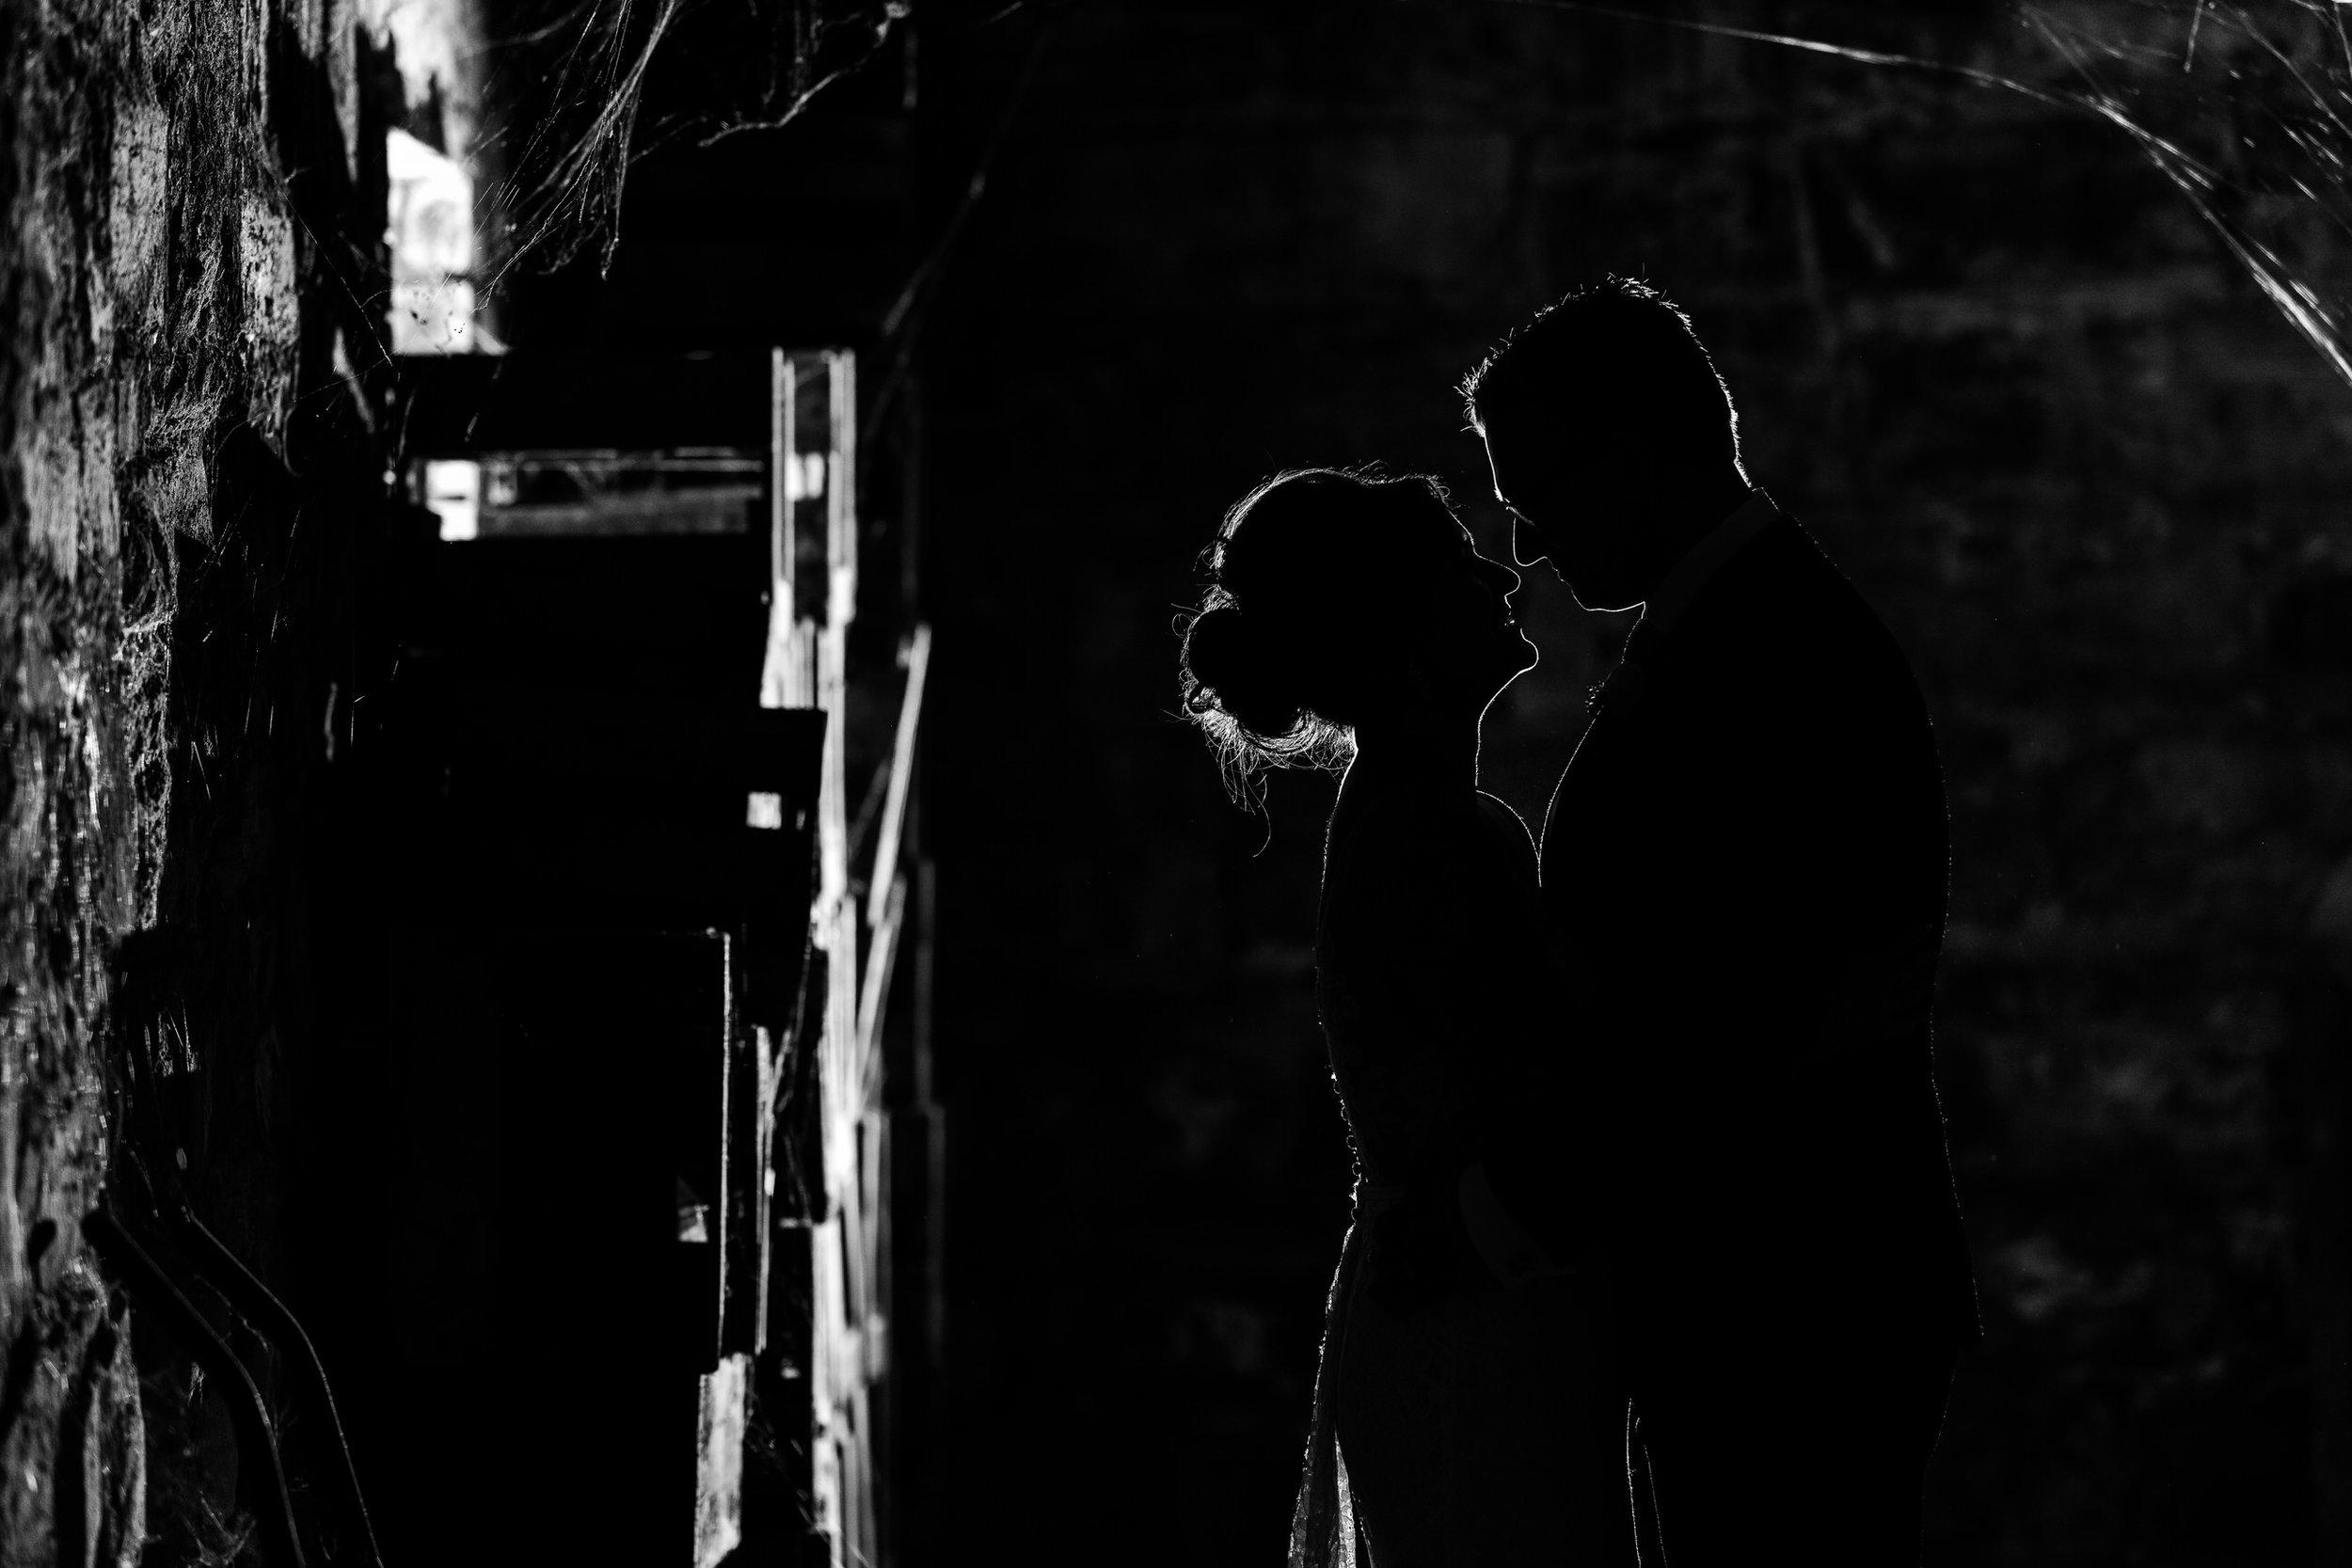 Justin_And_Jim_Photography_Chateau_Dore_Bendigo_Wedding105.JPG